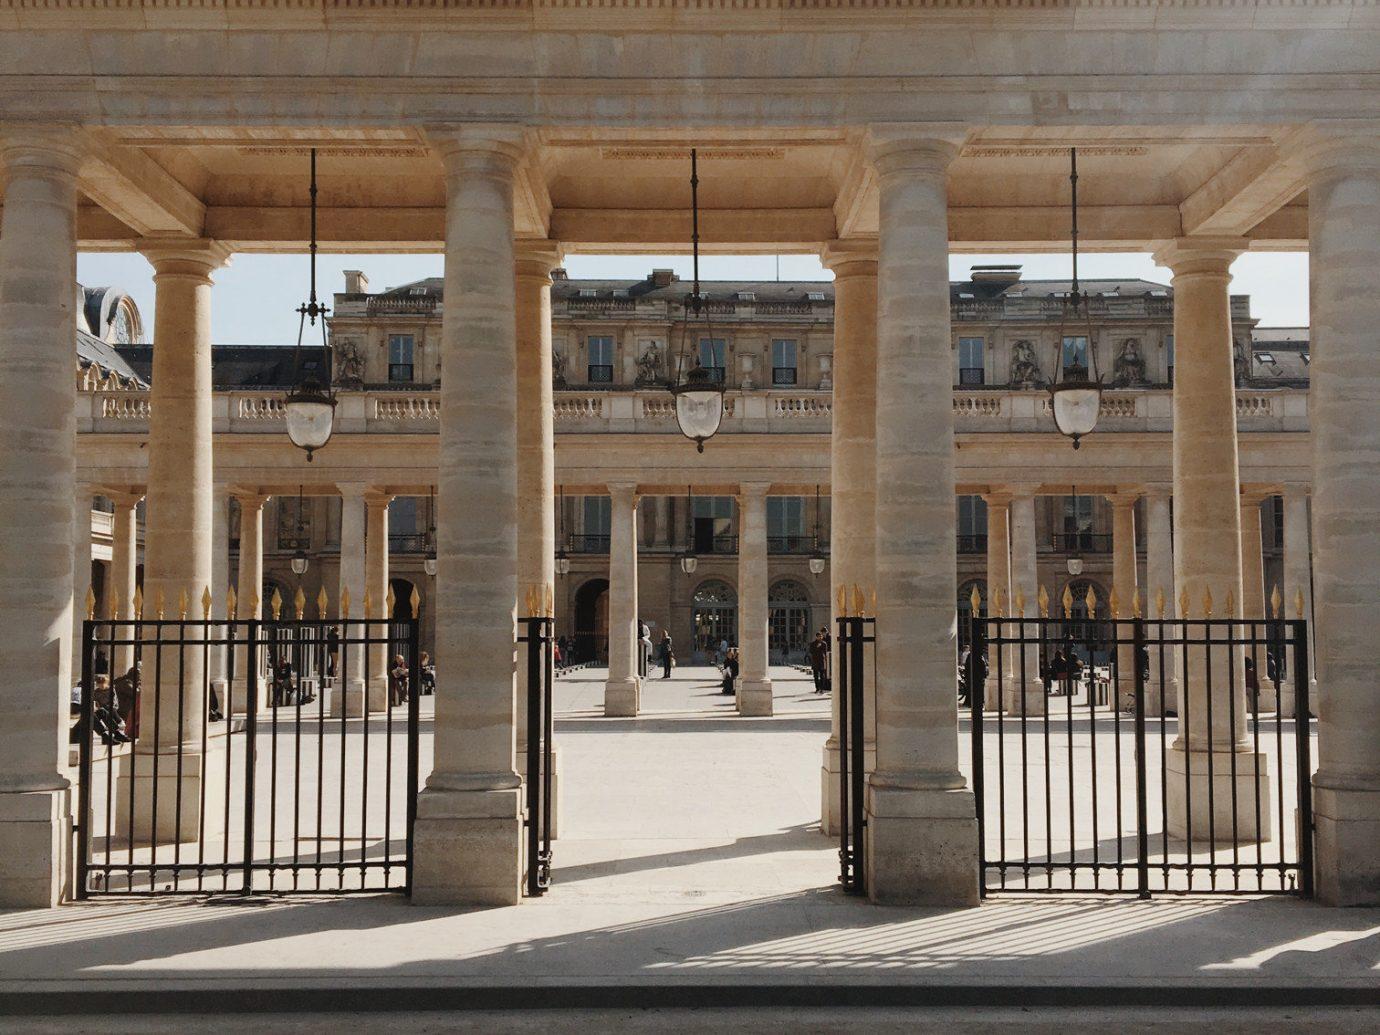 France Paris Trip Ideas building Architecture facade interior design plaza colonnade walkway